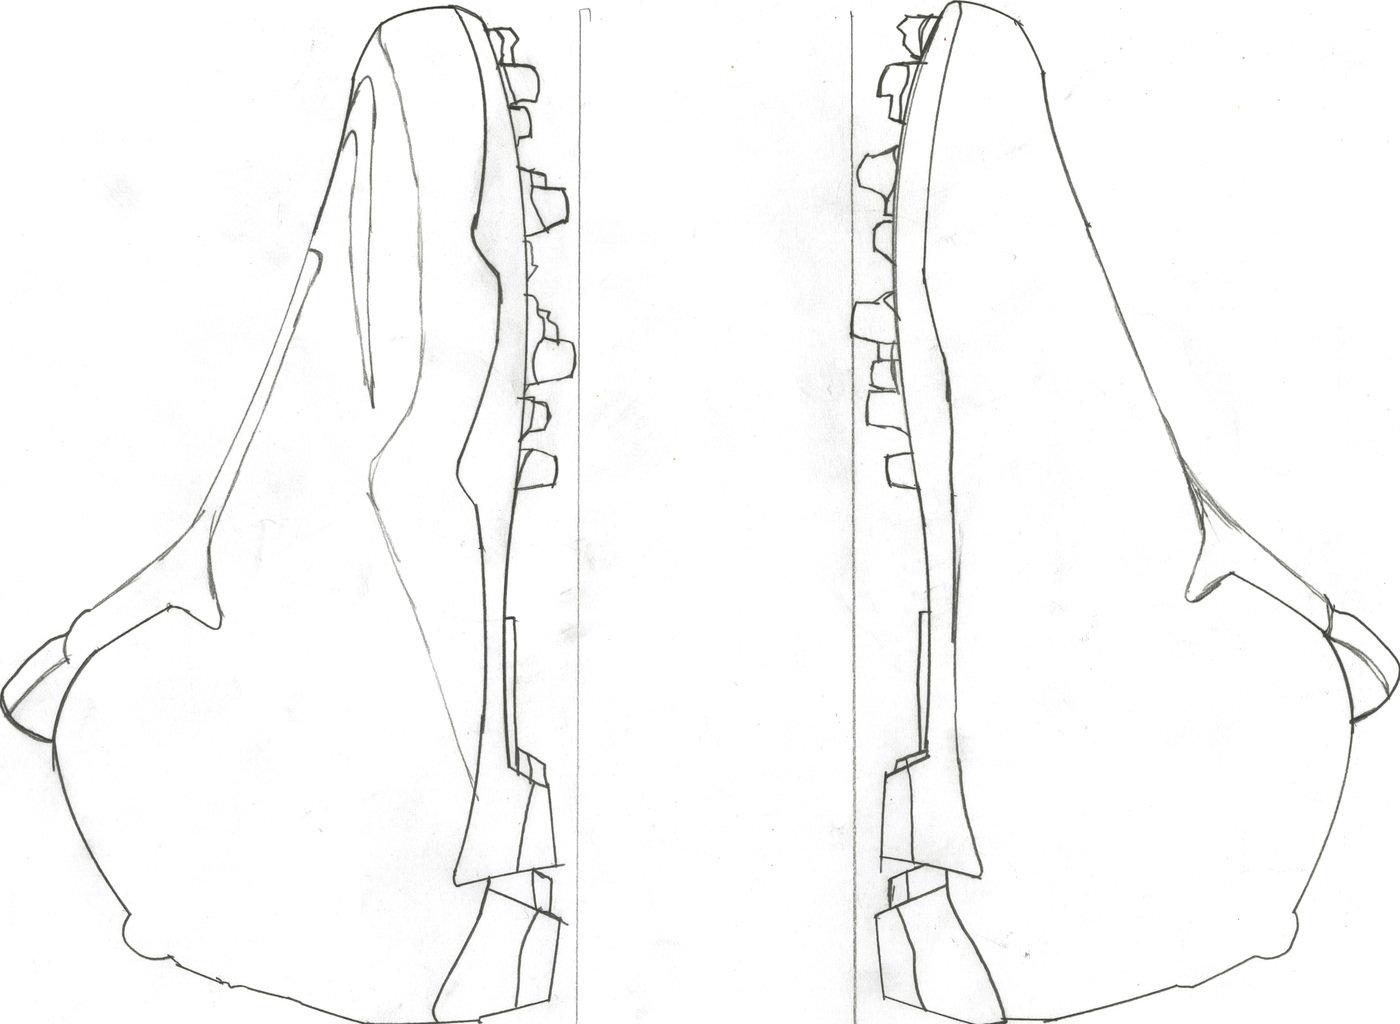 Senior Thesis Design Football Cleat by Michael Ryan Zaleta